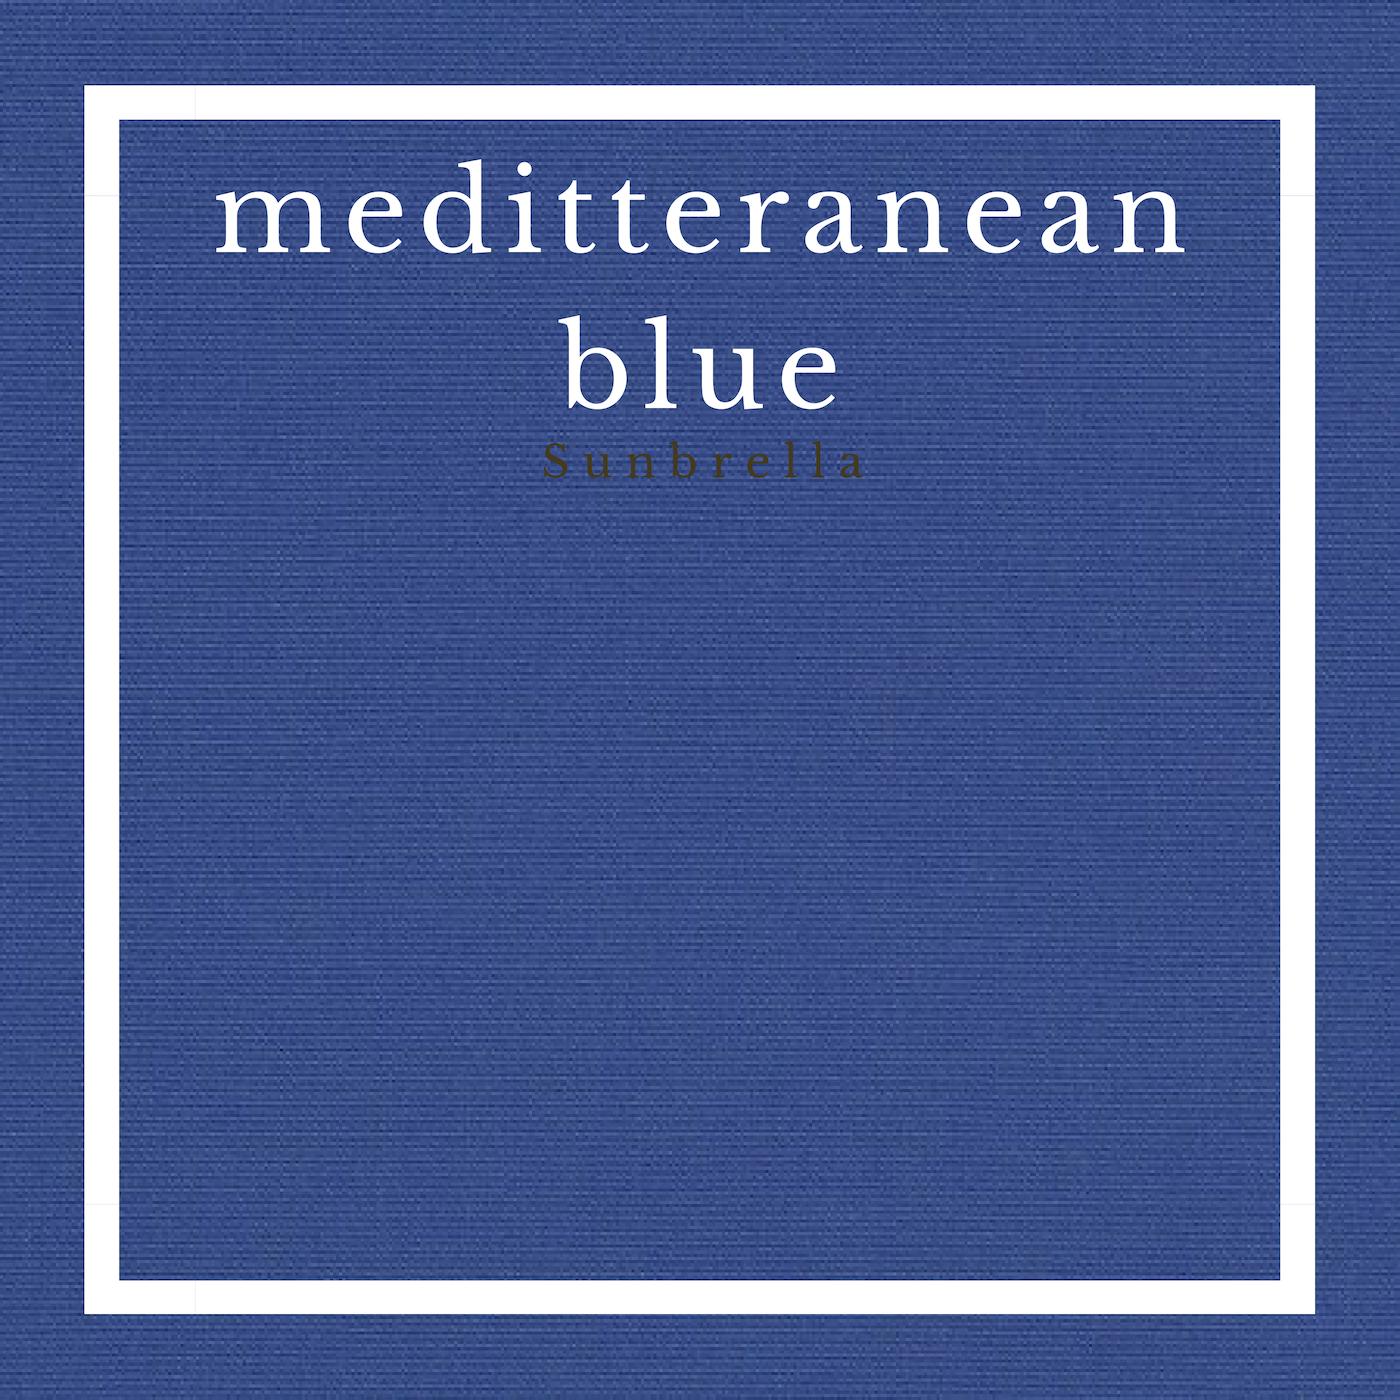 meditteranean-blue sunbrella ledge lounger